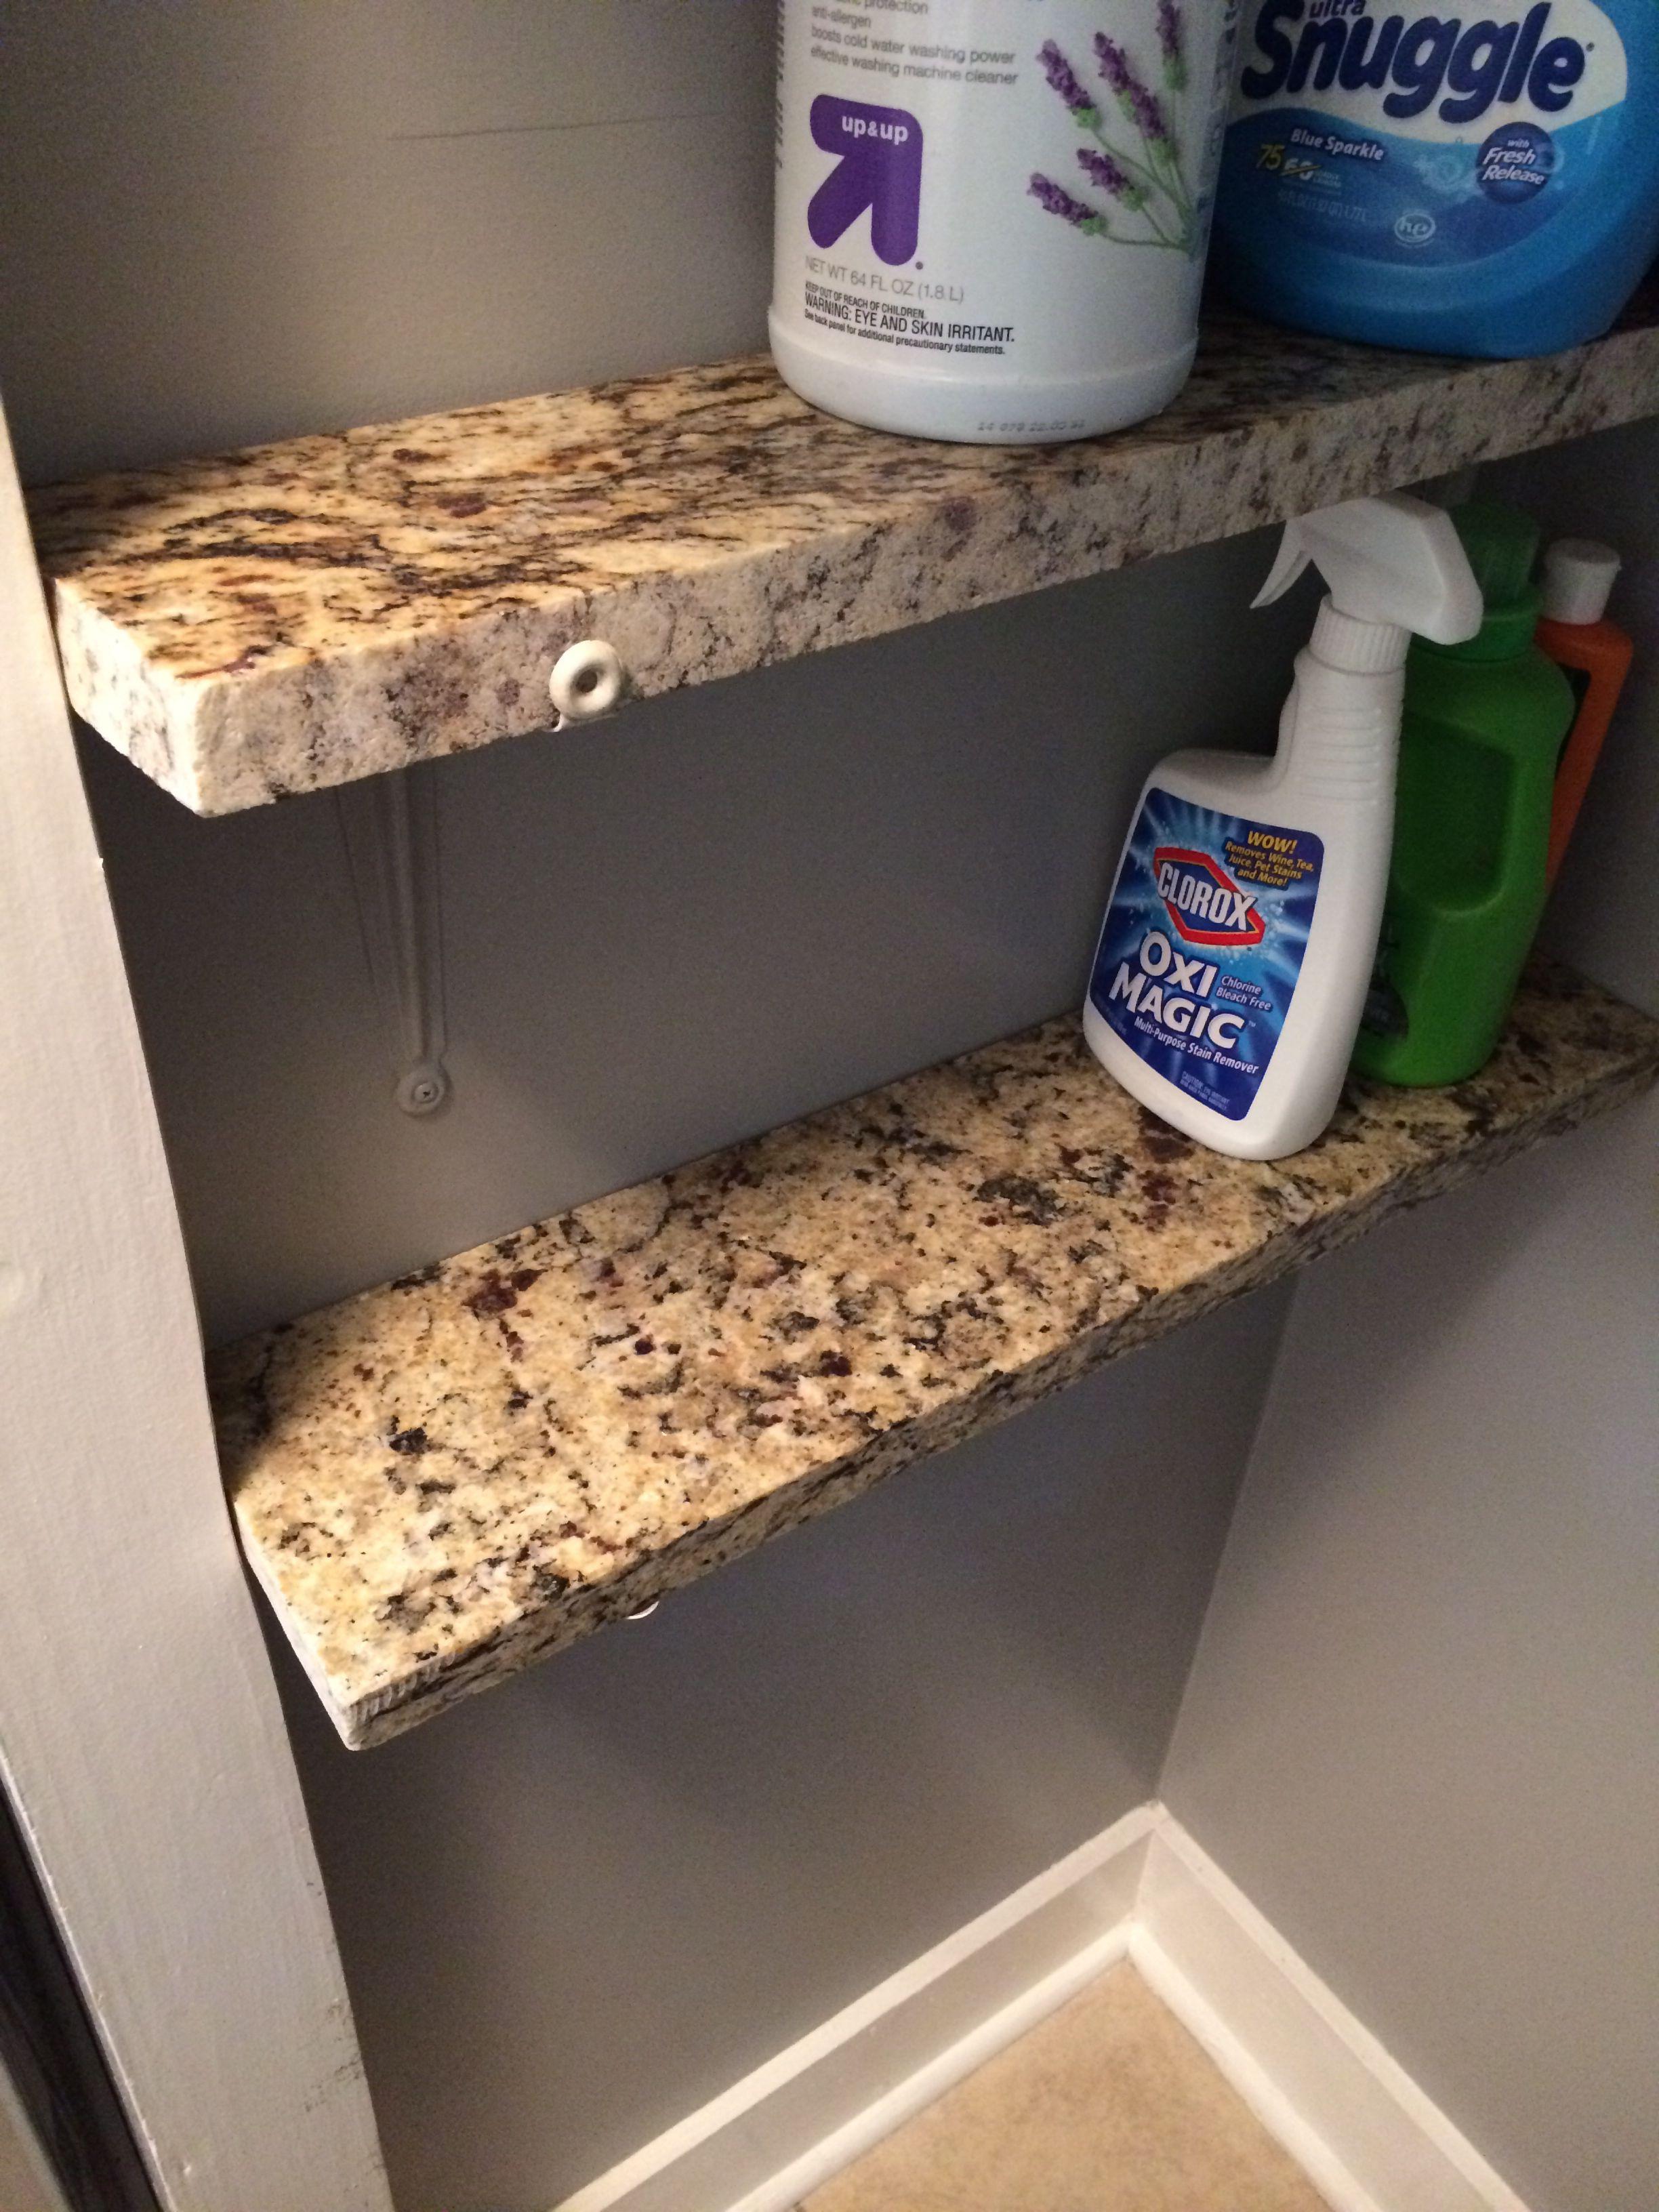 granite shelves in my laundry room from leftover granite scraps